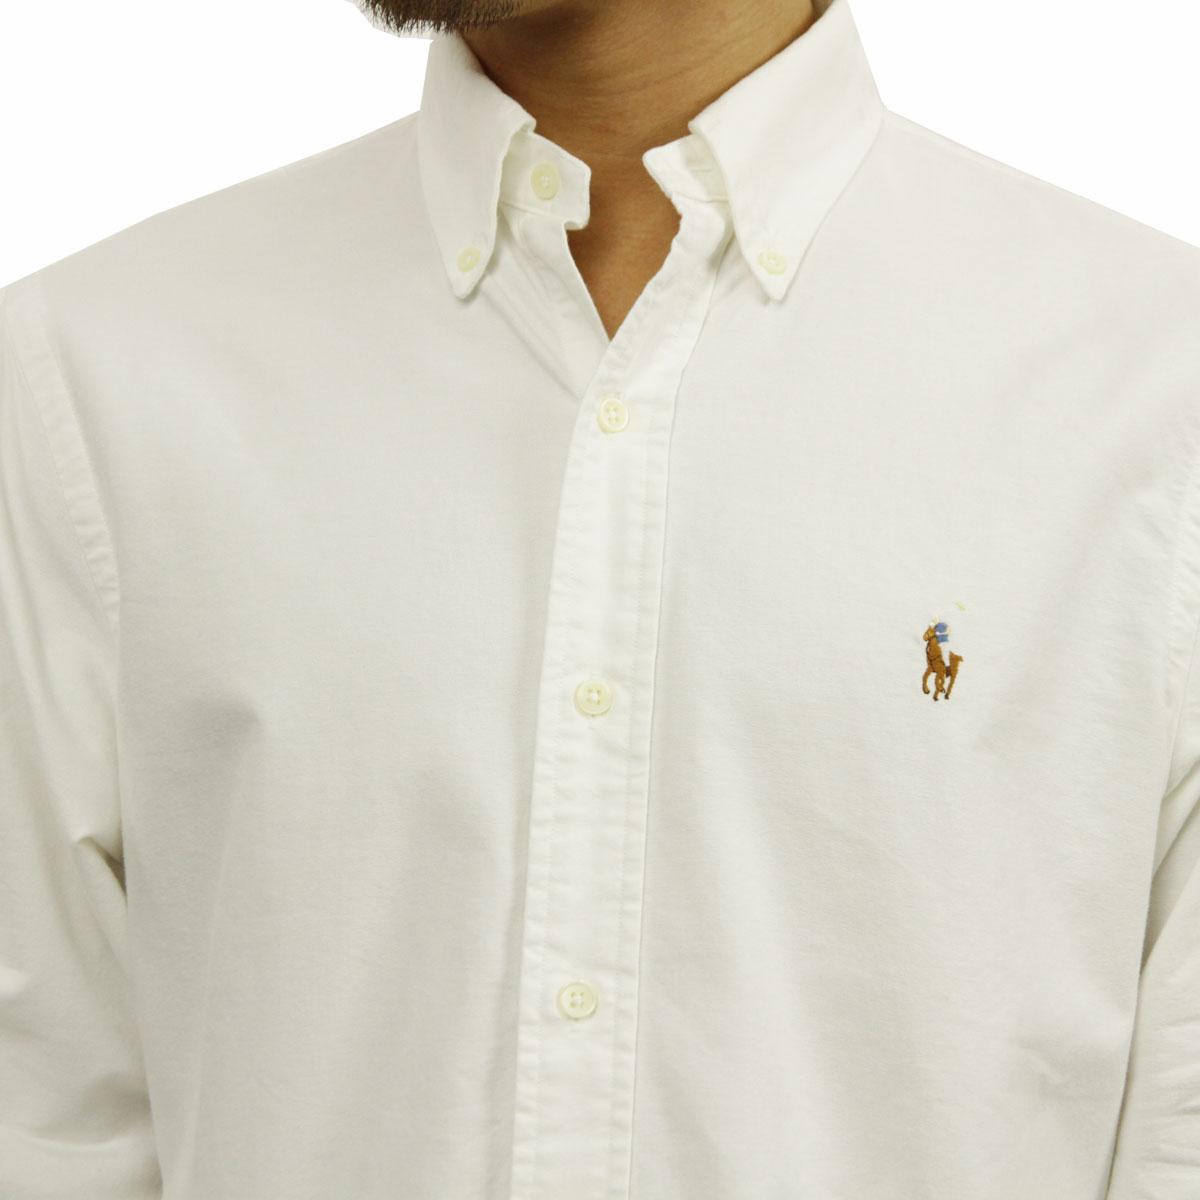 ????????? POLO RALPH LAUREN ??? ??? ????? Classic-Fit Oxford Shirt